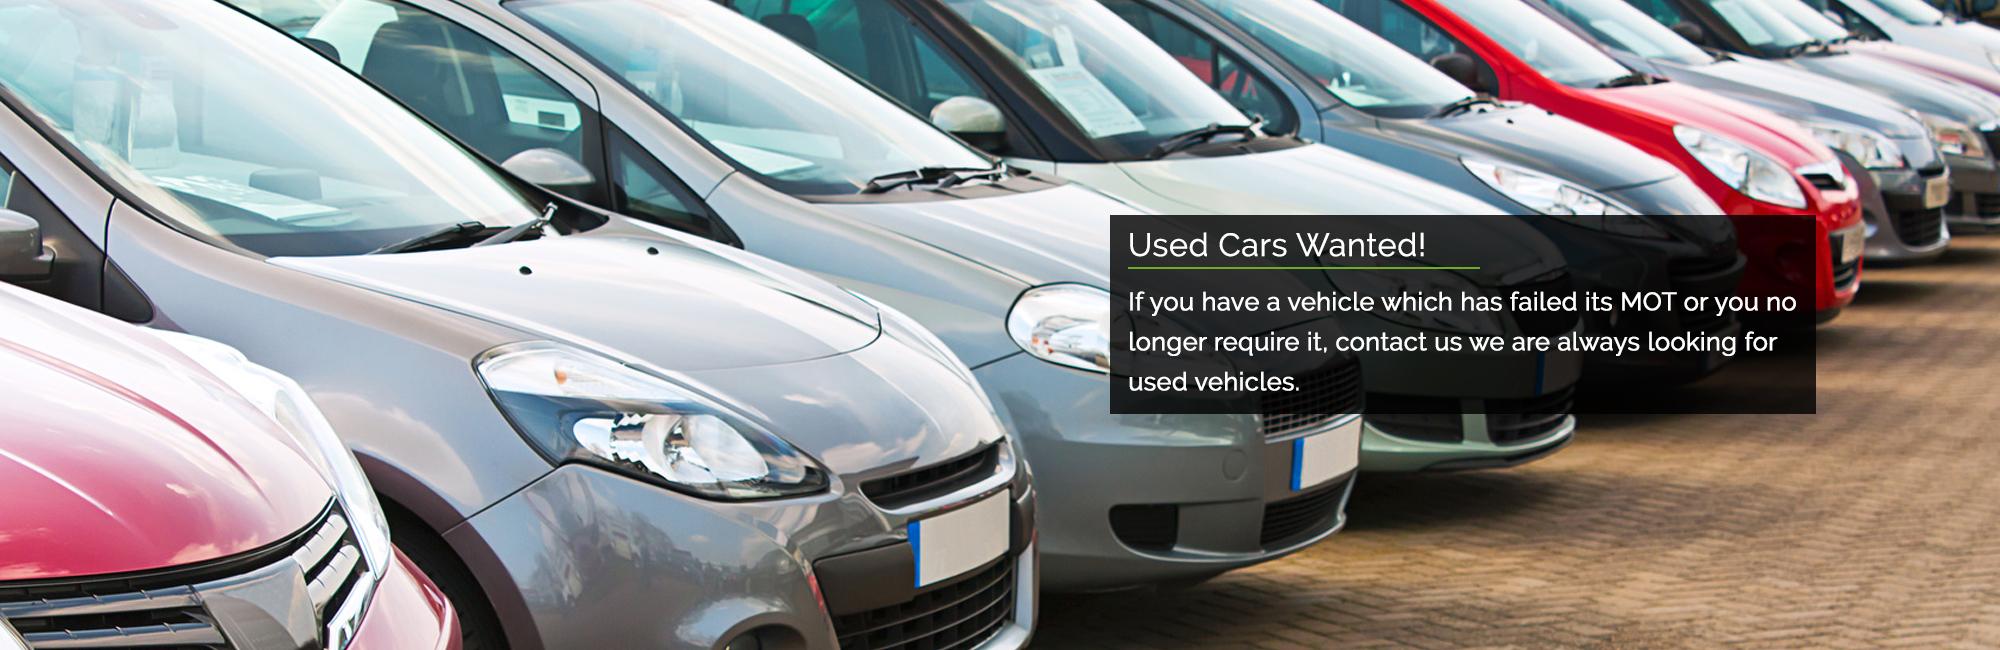 Scrap My Car Surrey | Fellow Green Salvage | Scrap My Vehicle Surrey ...